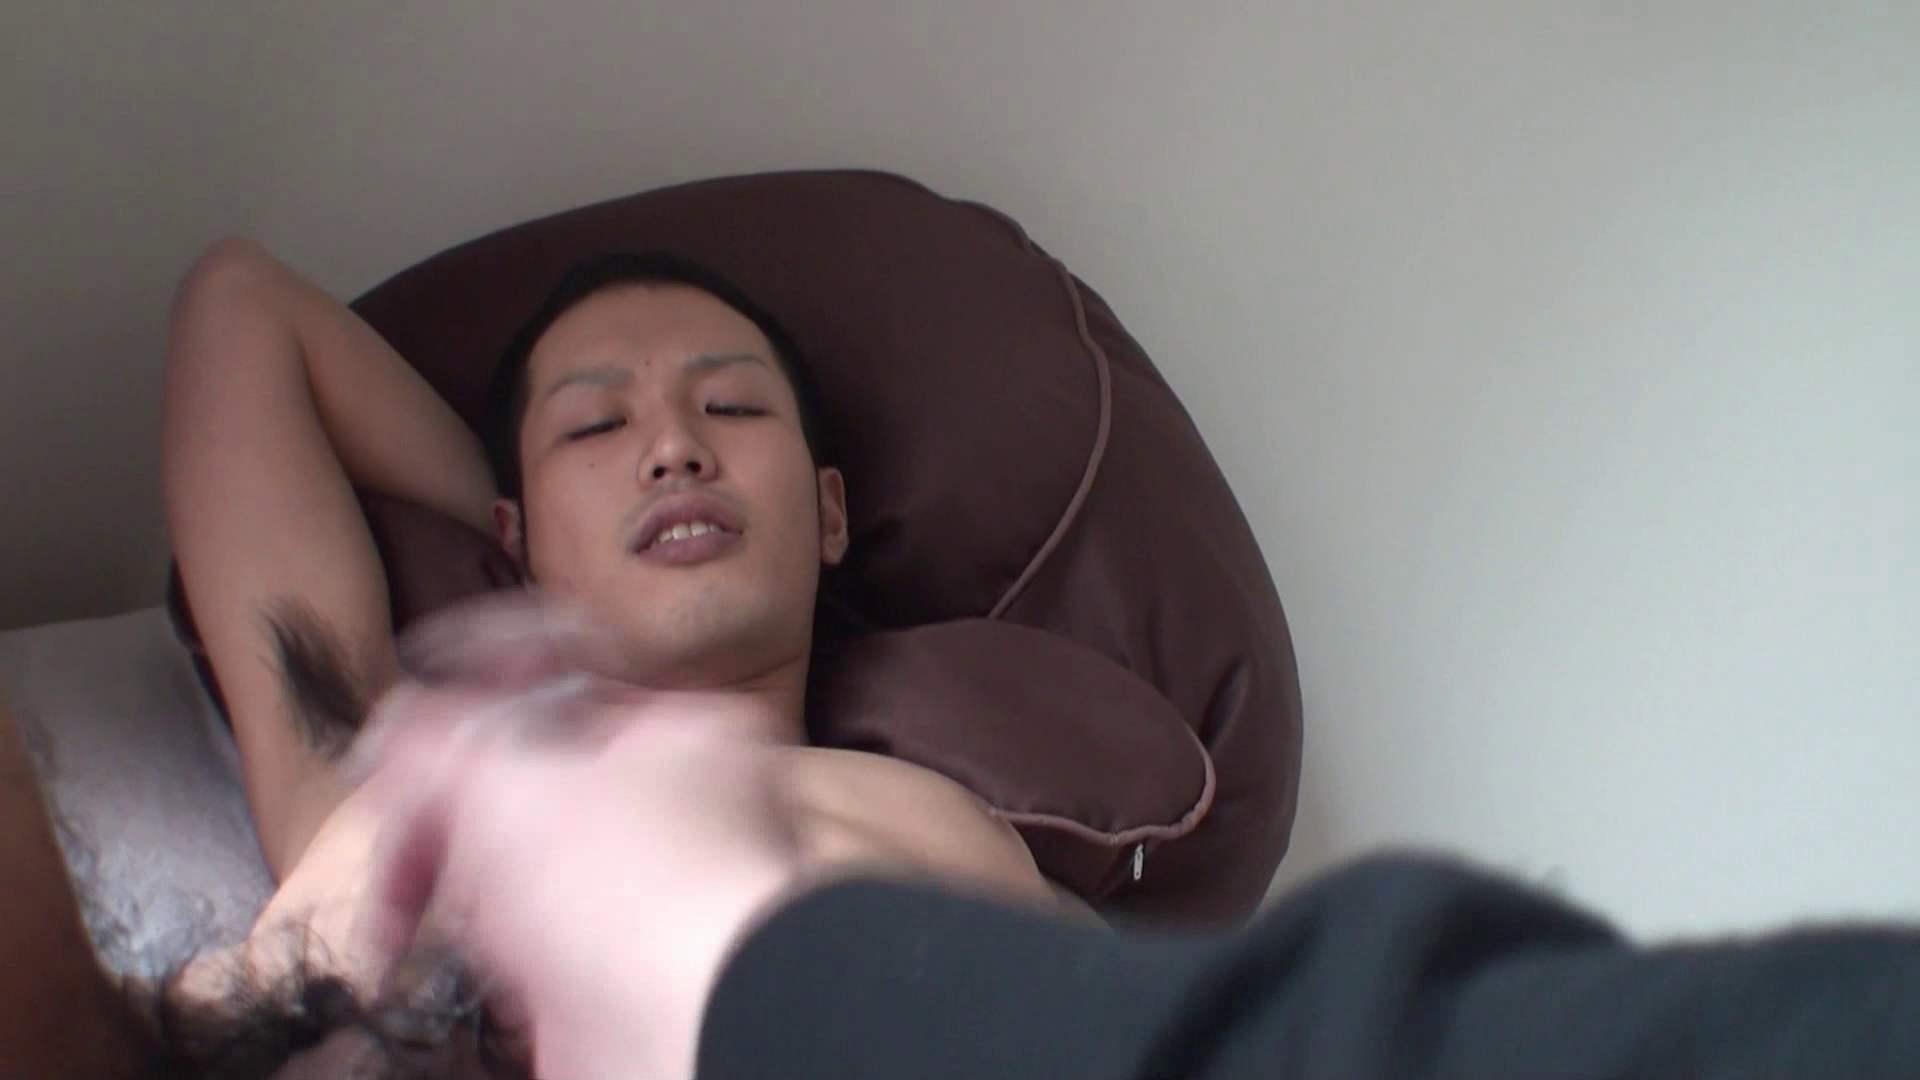 HD 良太と健二当たり前の日常 セックス編 セックス ゲイ無修正動画画像 52連発 8